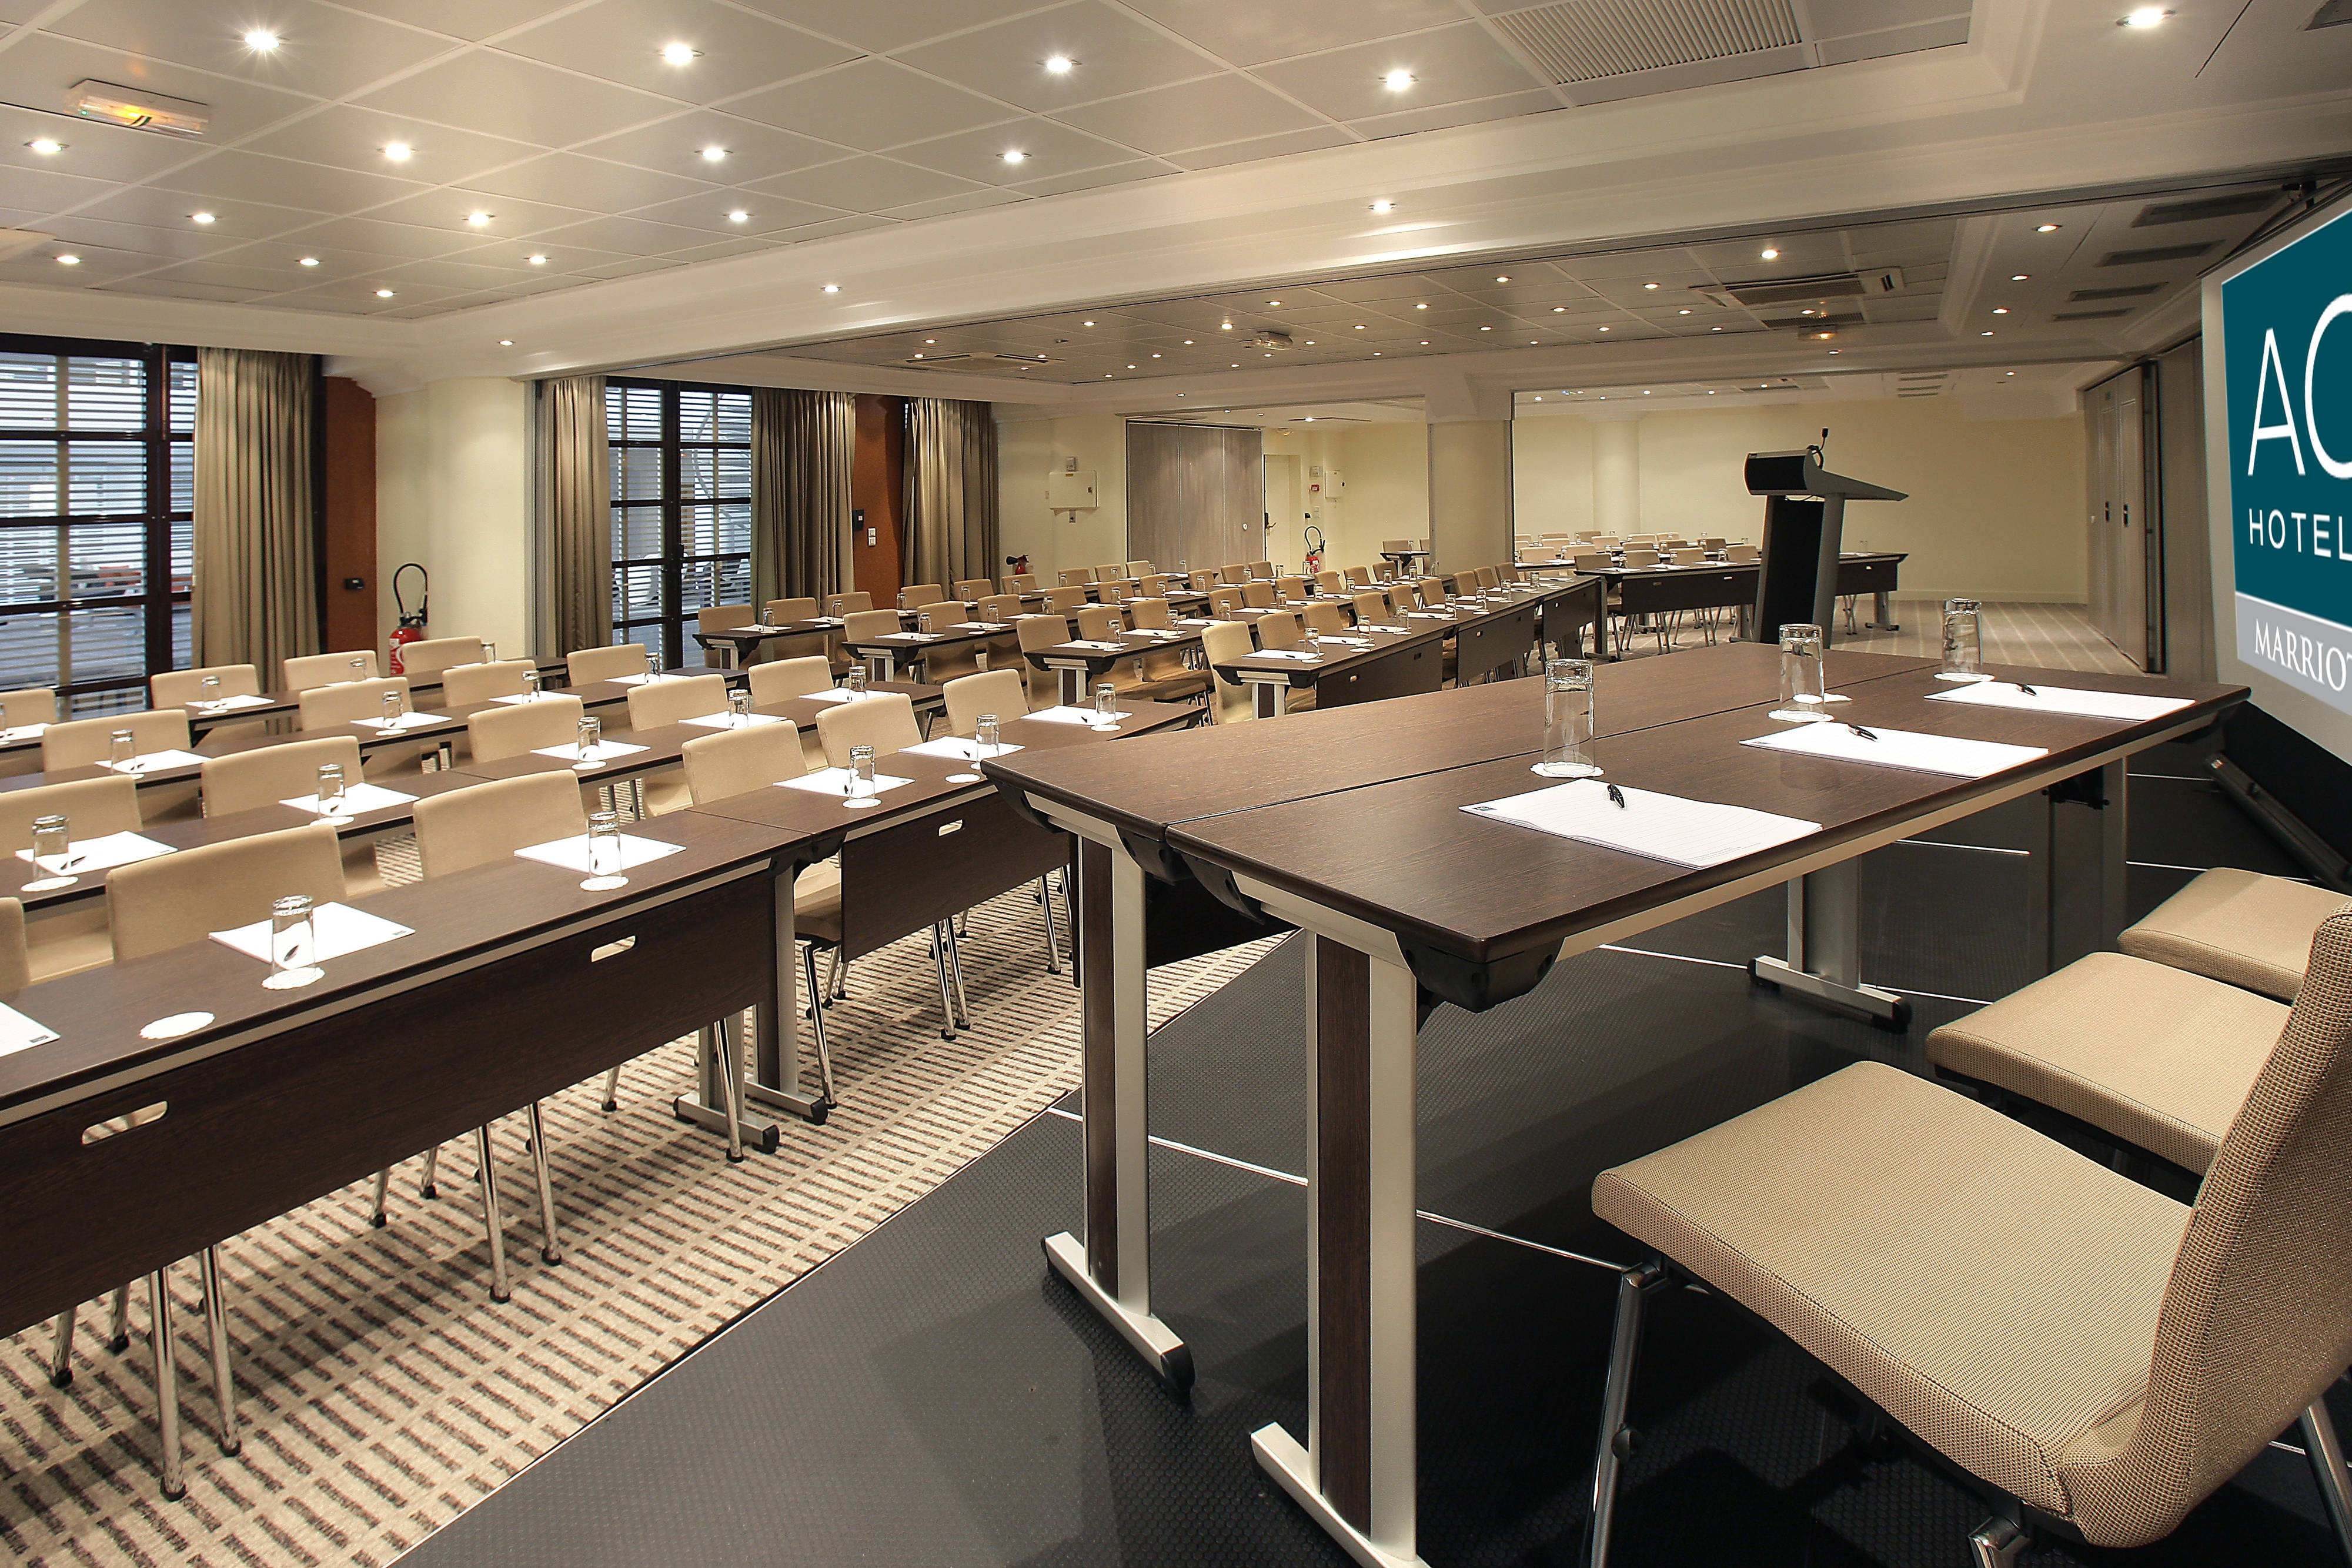 Louis Arsmtrong Meeting room